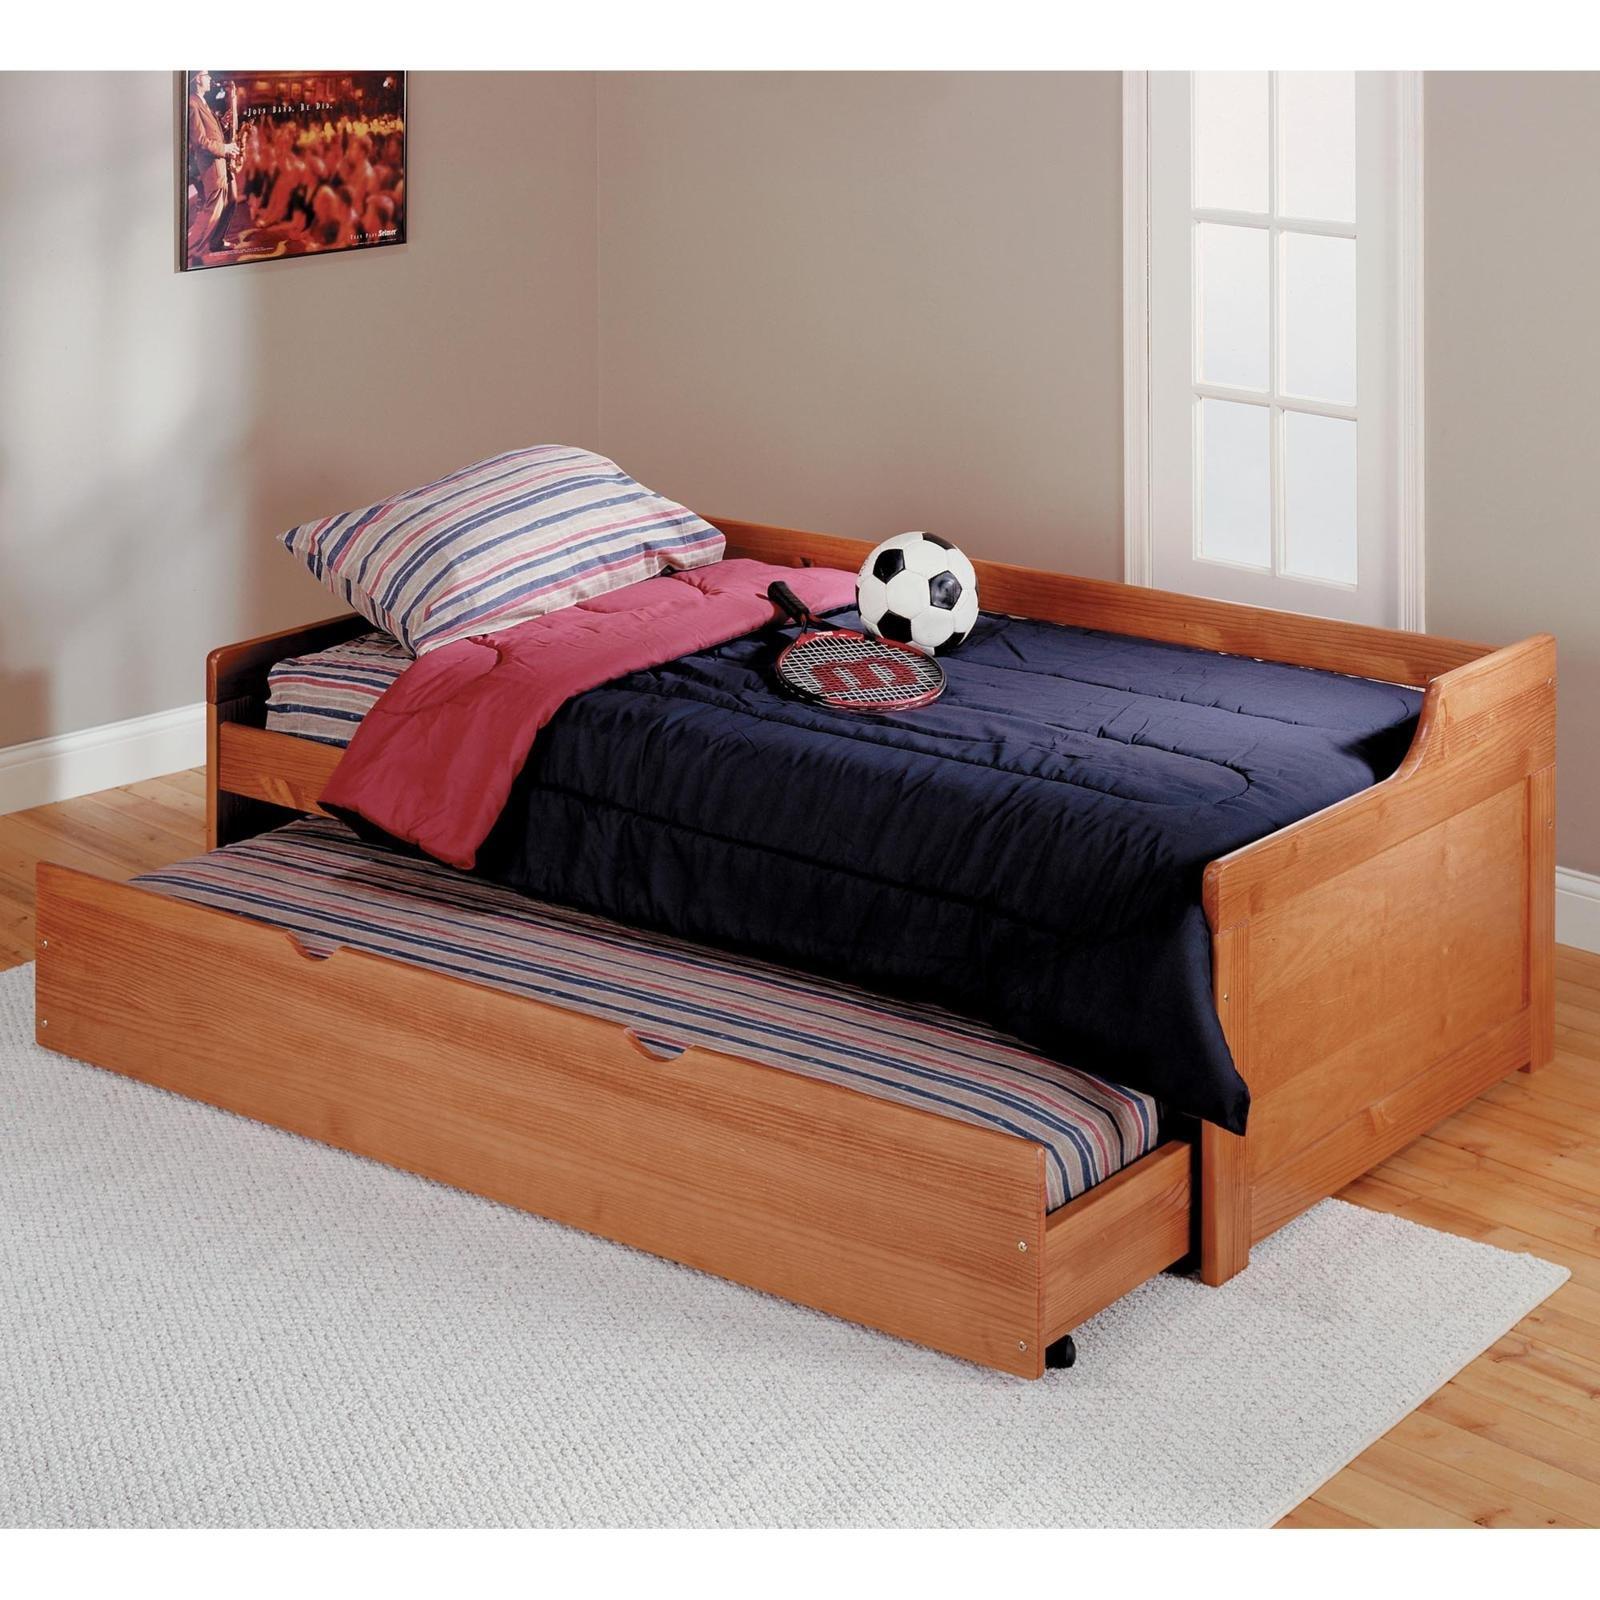 Trundle Bed Plans | BED PLANS DIY & BLUEPRINTS